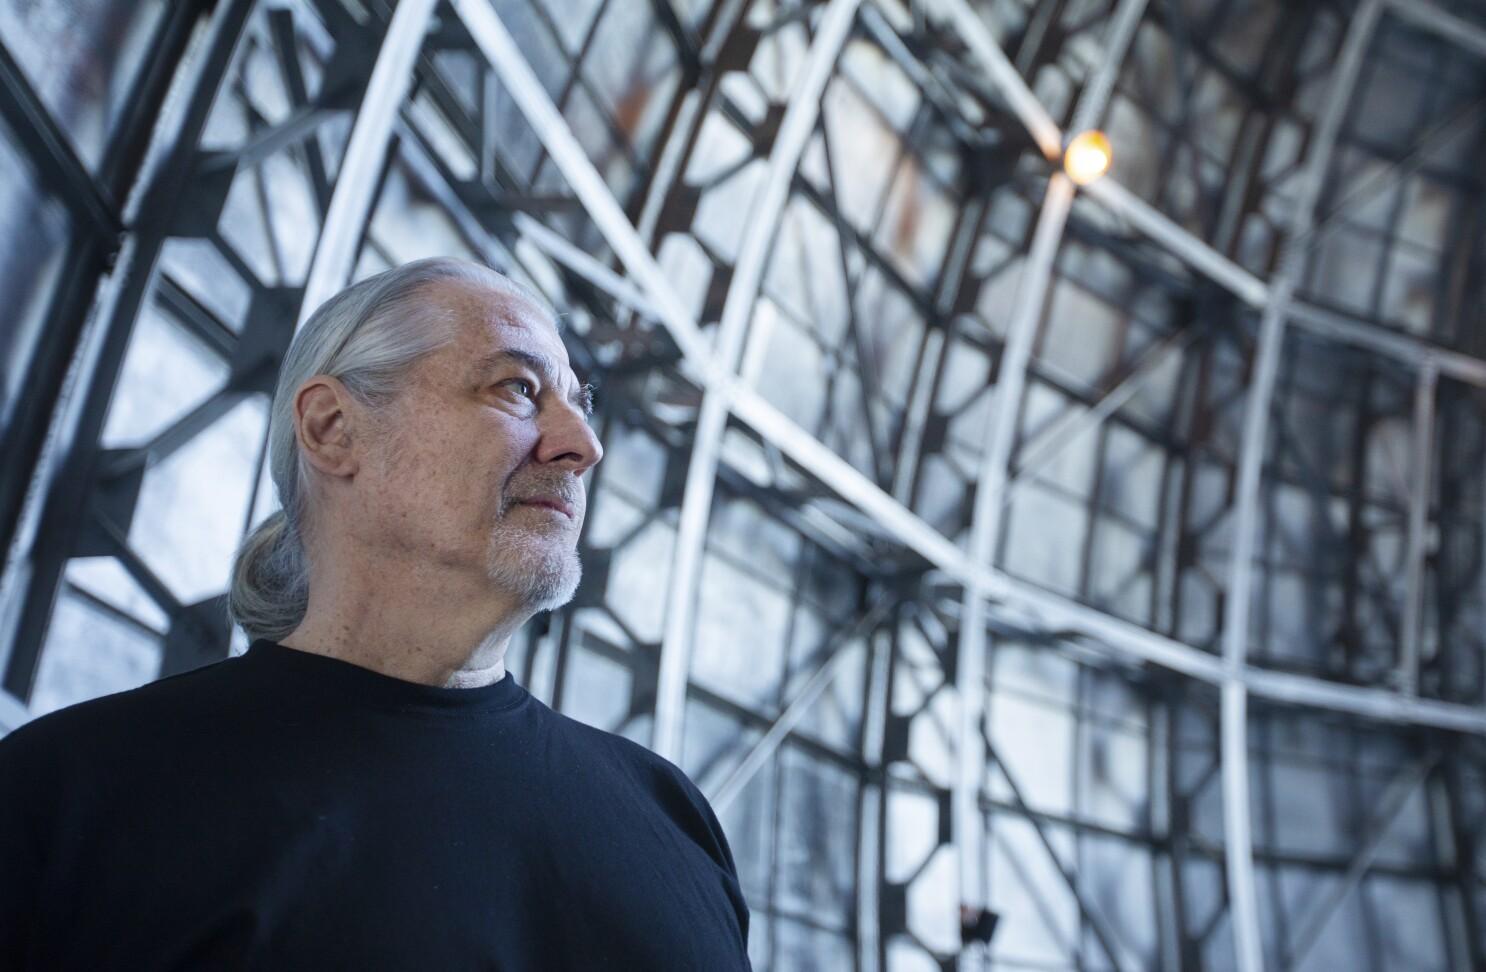 Review: At Mt. Wilson, cosmic sound art reaches far beyond a mere moon landing